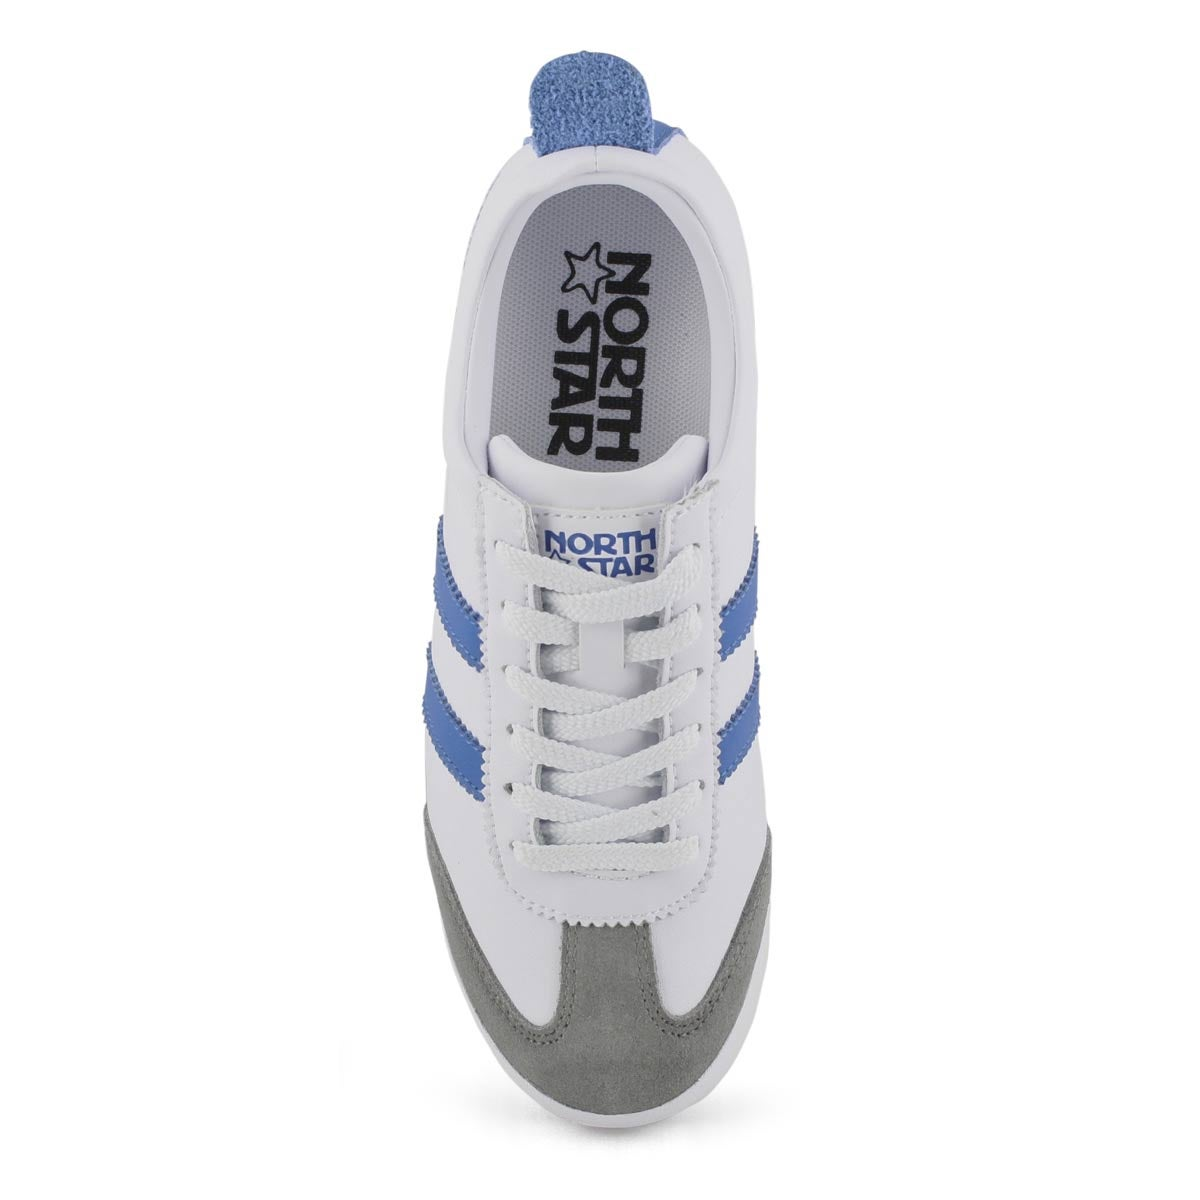 Lds North Star One white/ryl blu sneaker